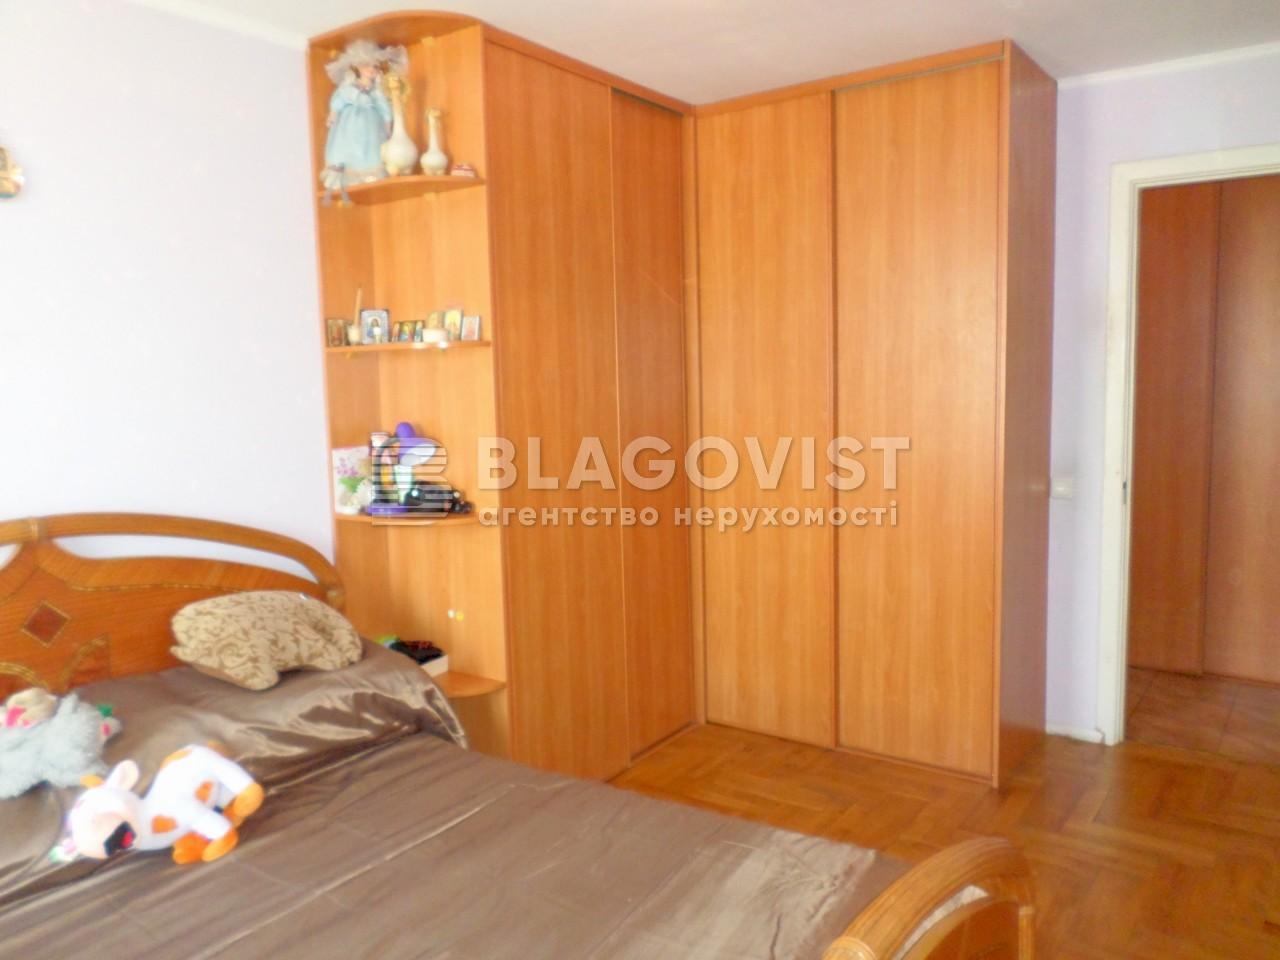 Квартира F-34331, Нововокзальная, 21, Киев - Фото 7